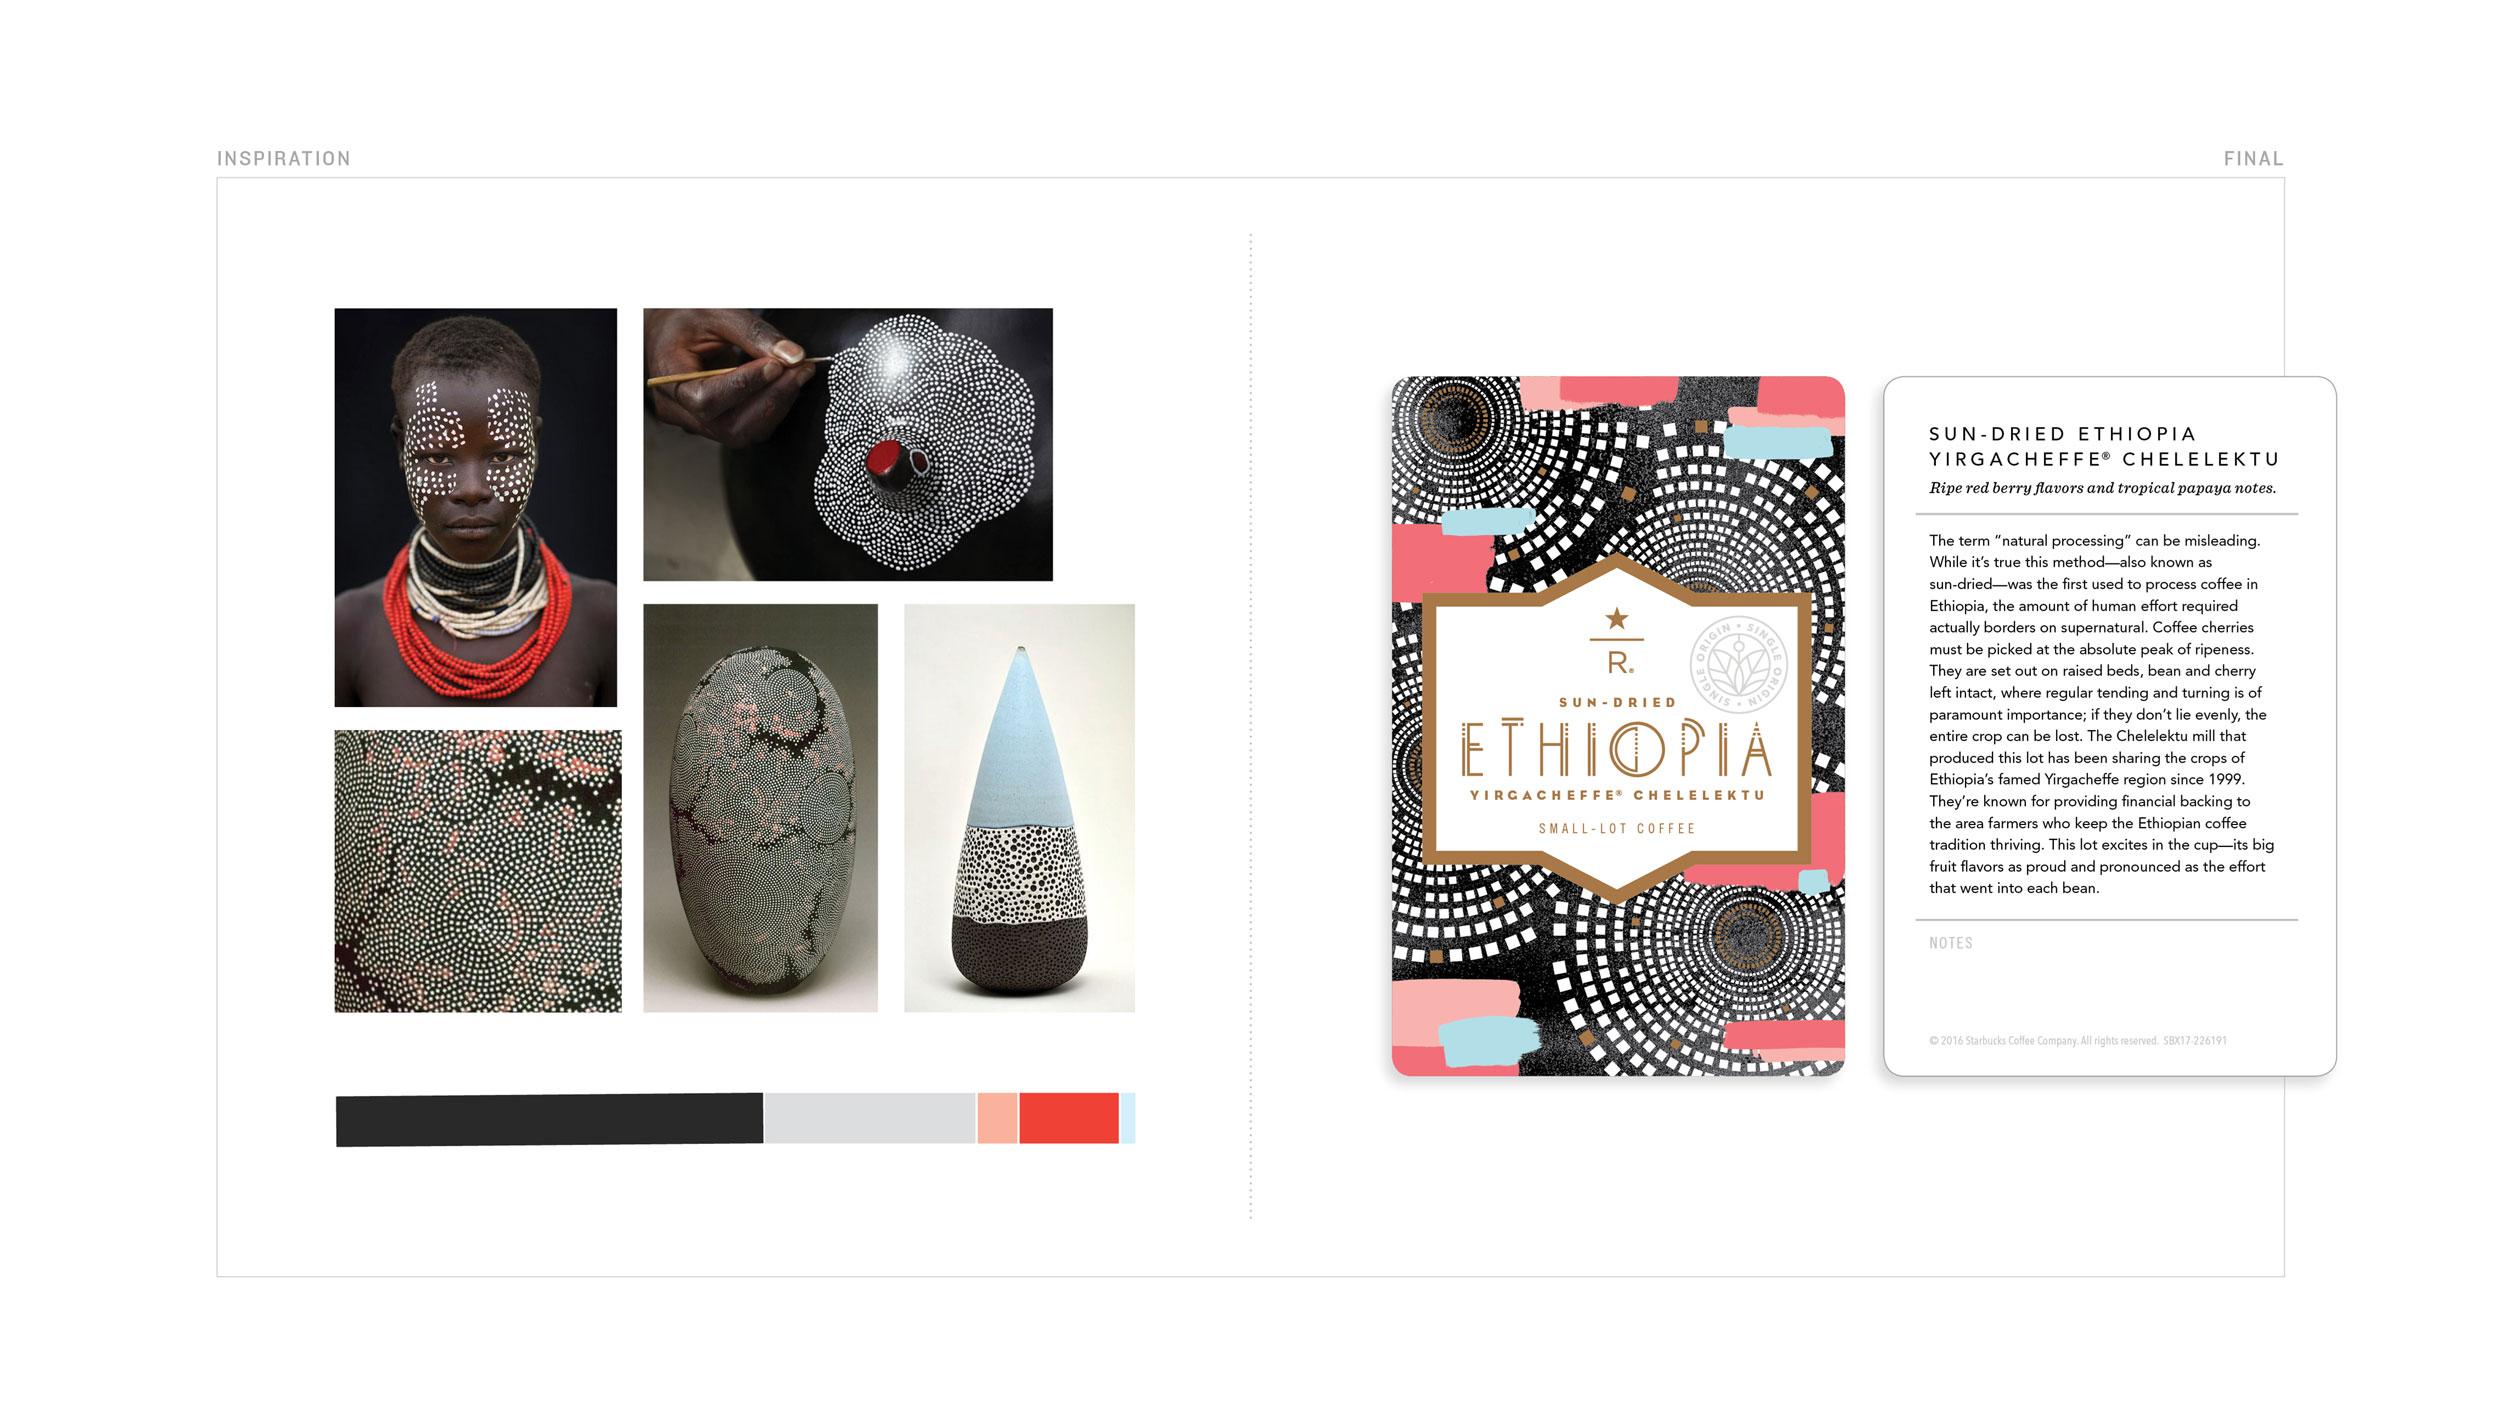 Ethiopia-Chelelektu-Reserve-Cards-INSPIRATION.jpg